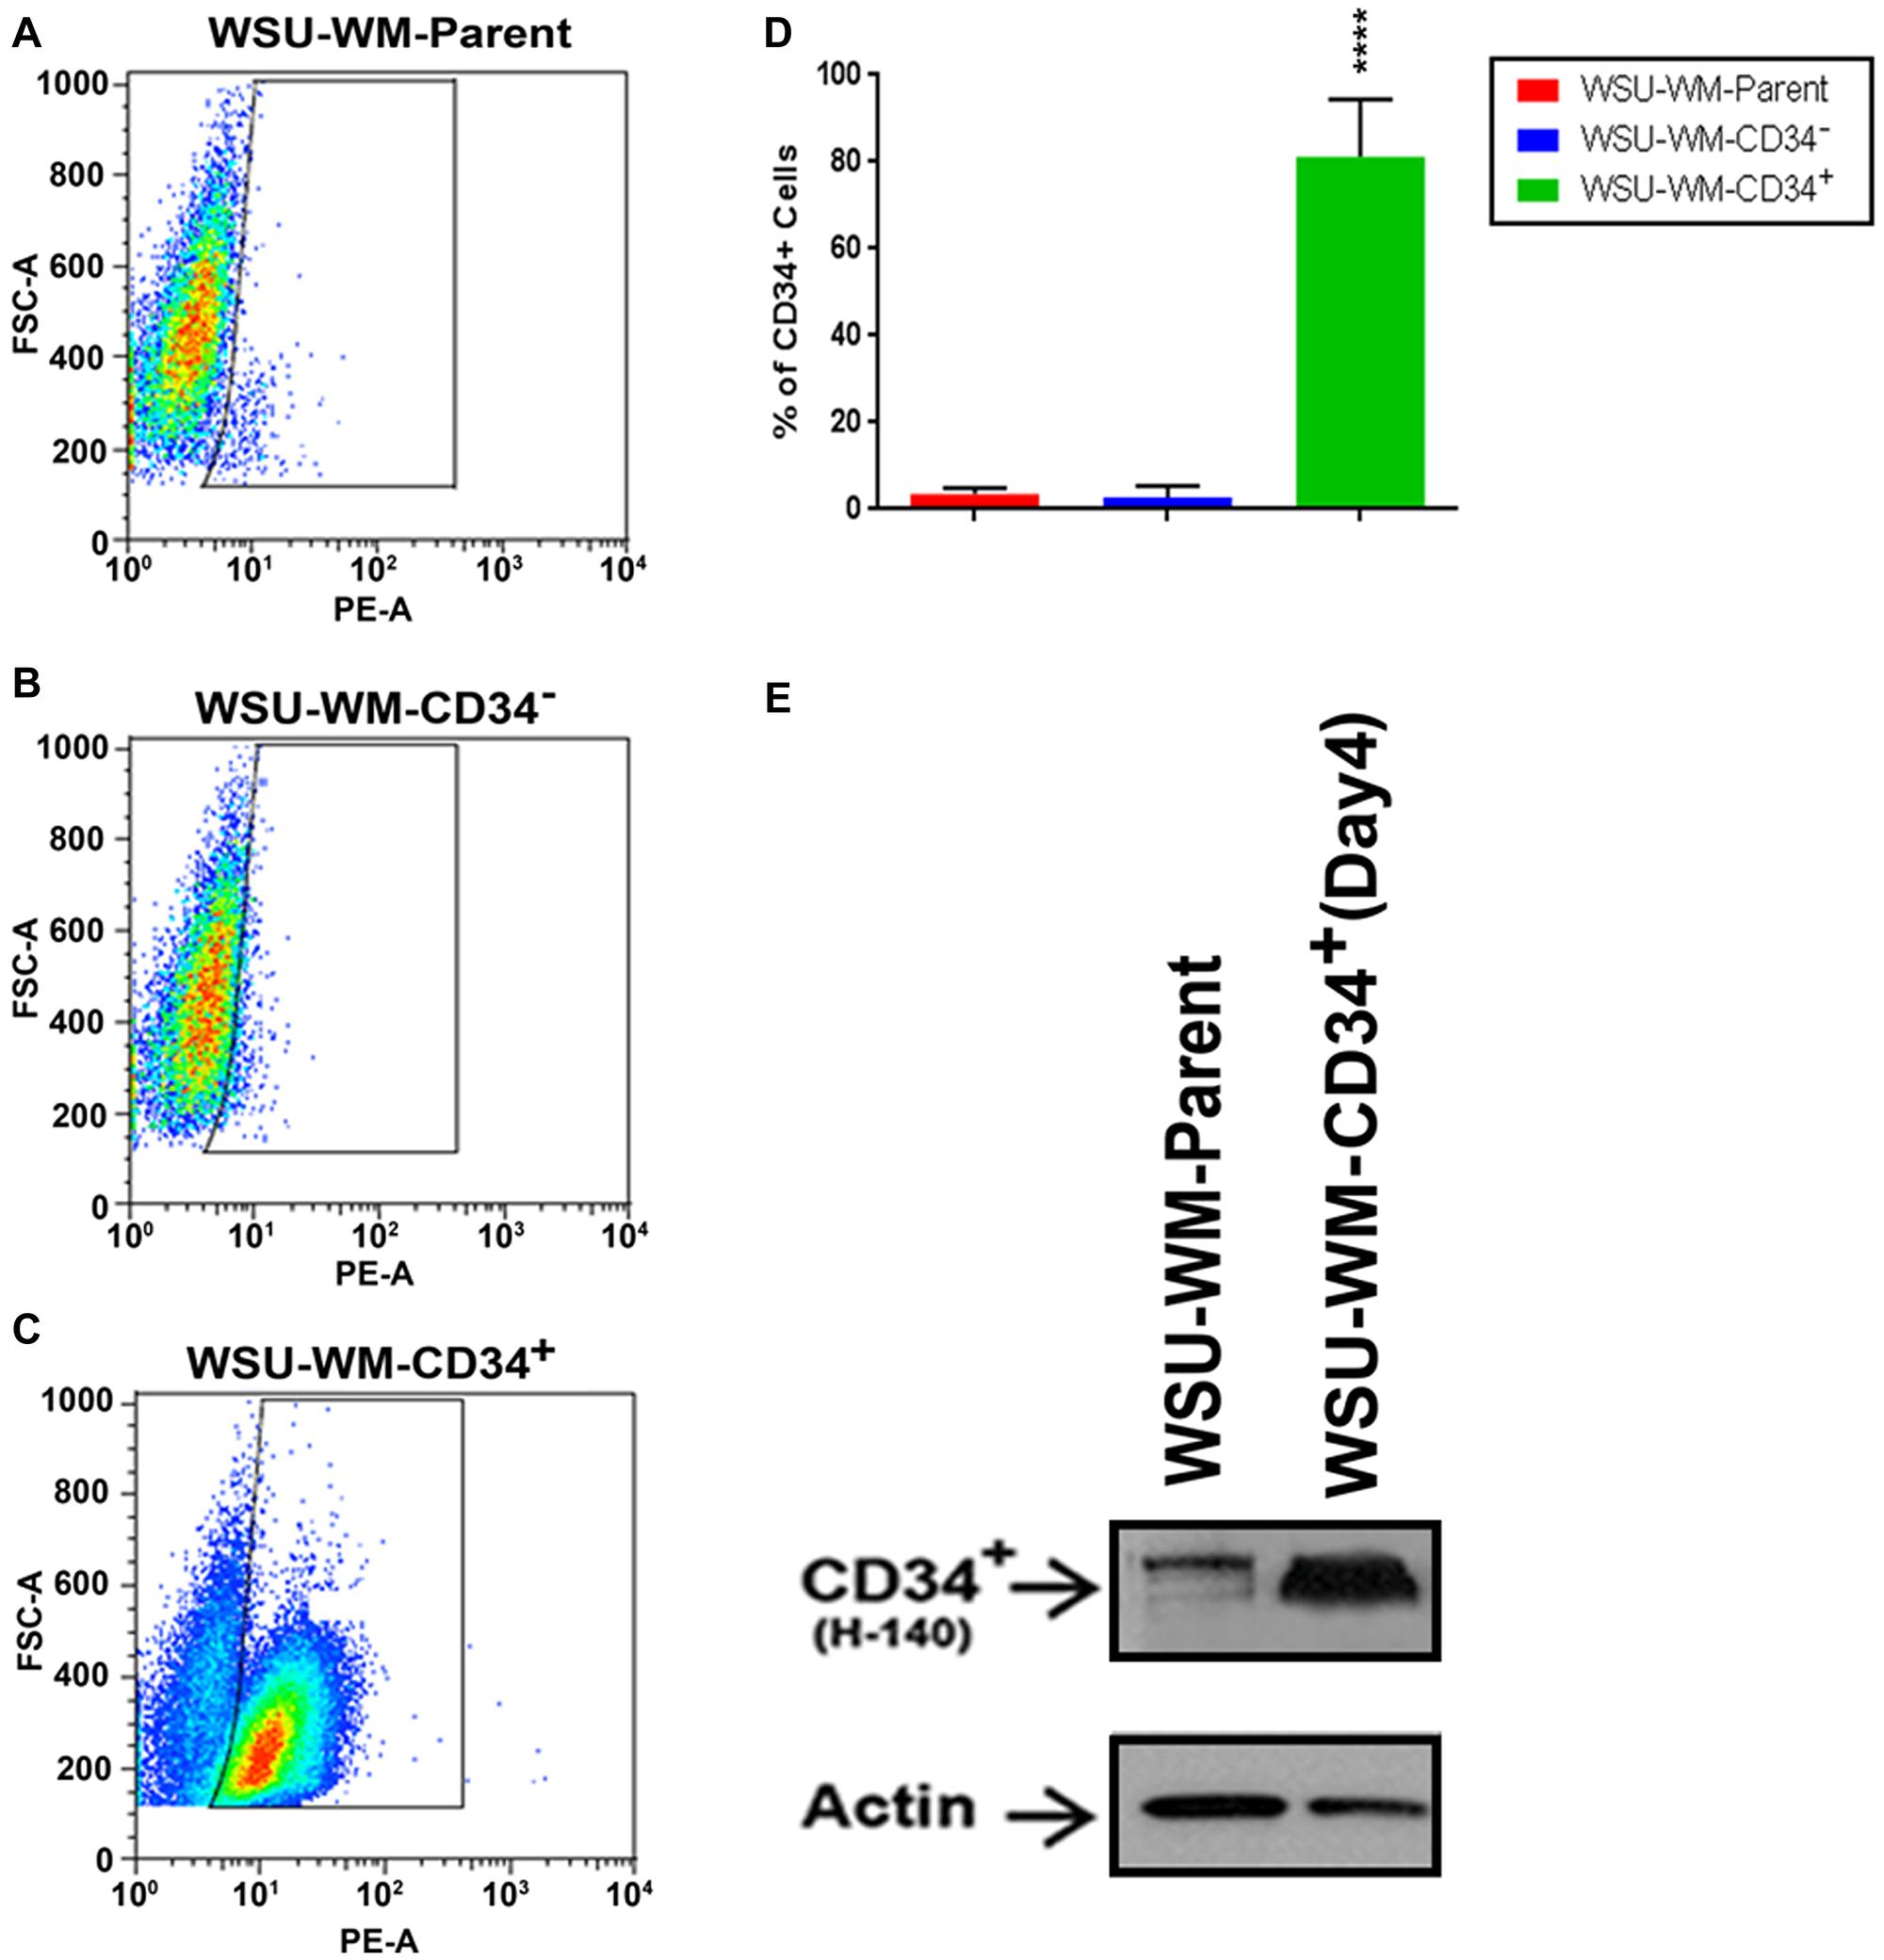 FACS analysis of WSU-WM using CD34 magnetic beads isolation.